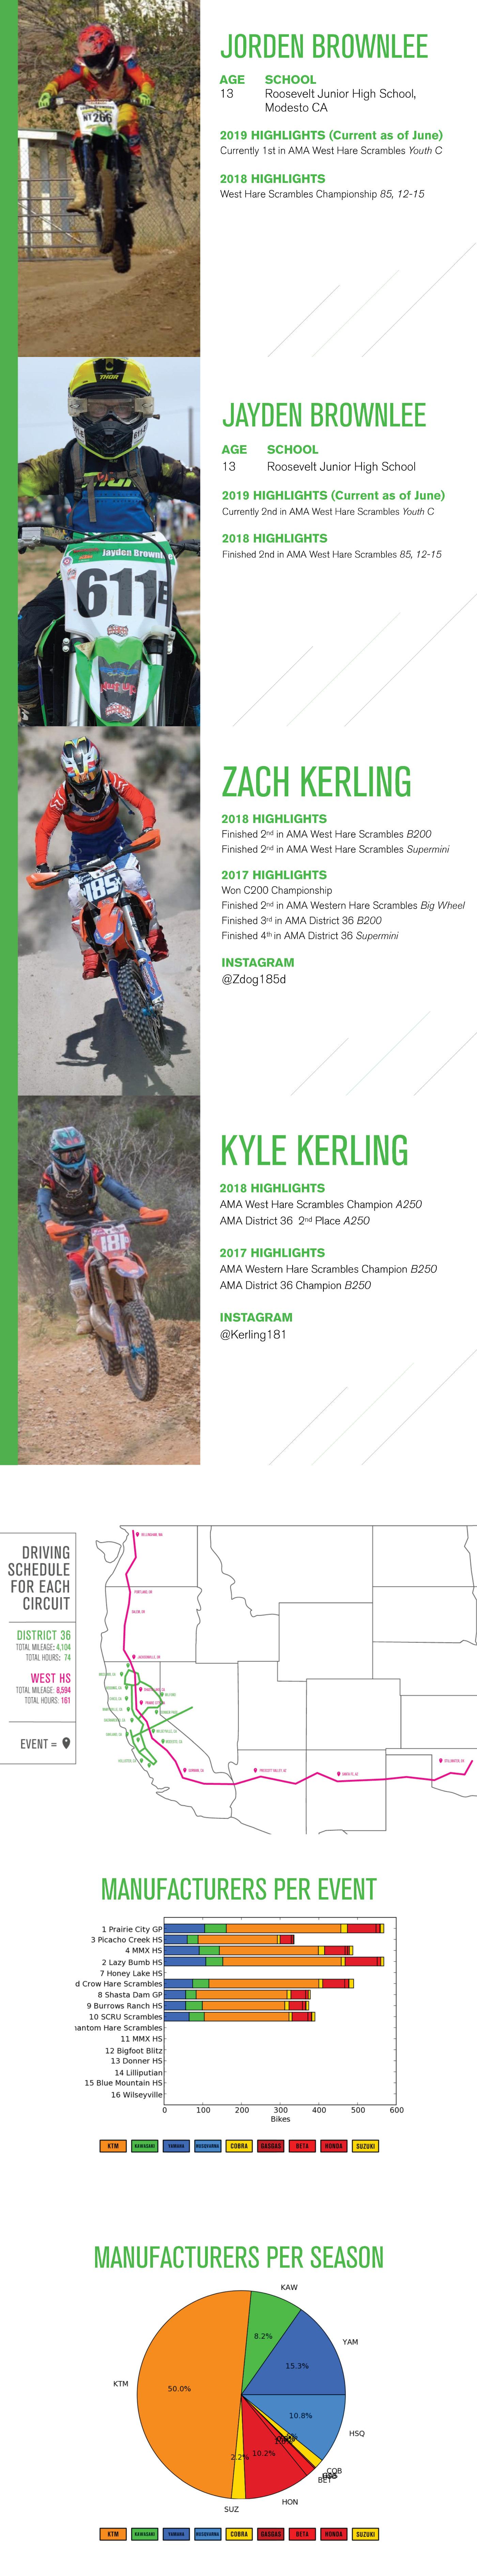 Apple Keynote presentation design Pitch decks Motocross SPONSORSHIP DECK